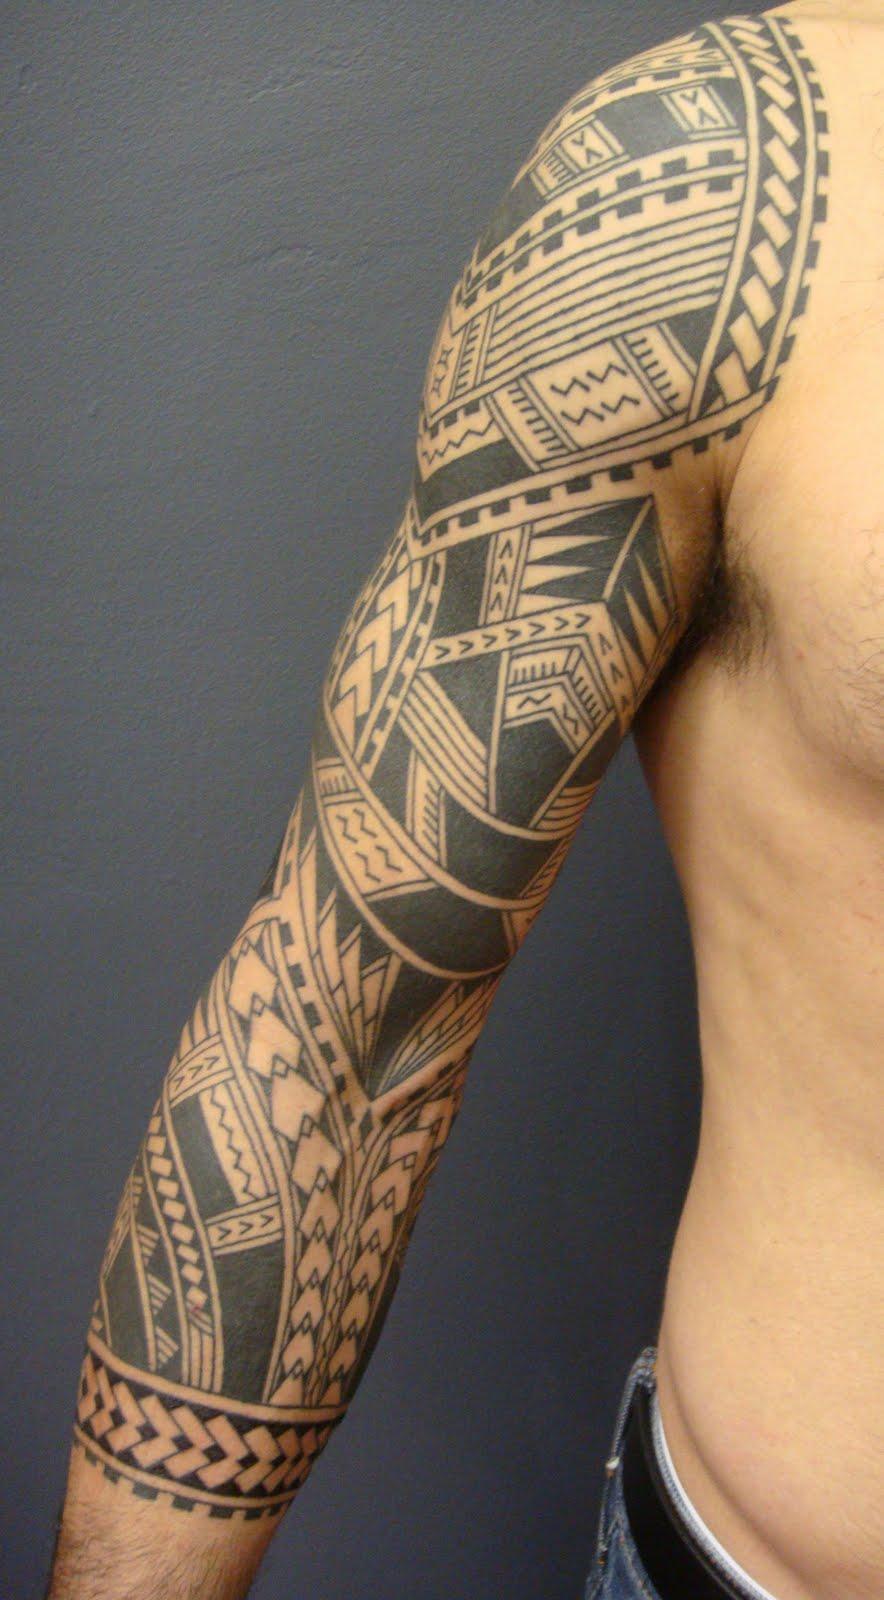 829cee436 samoan sleeve tattoo samoa sleeve tattoo lilzeu tattoo de 77367 jpg